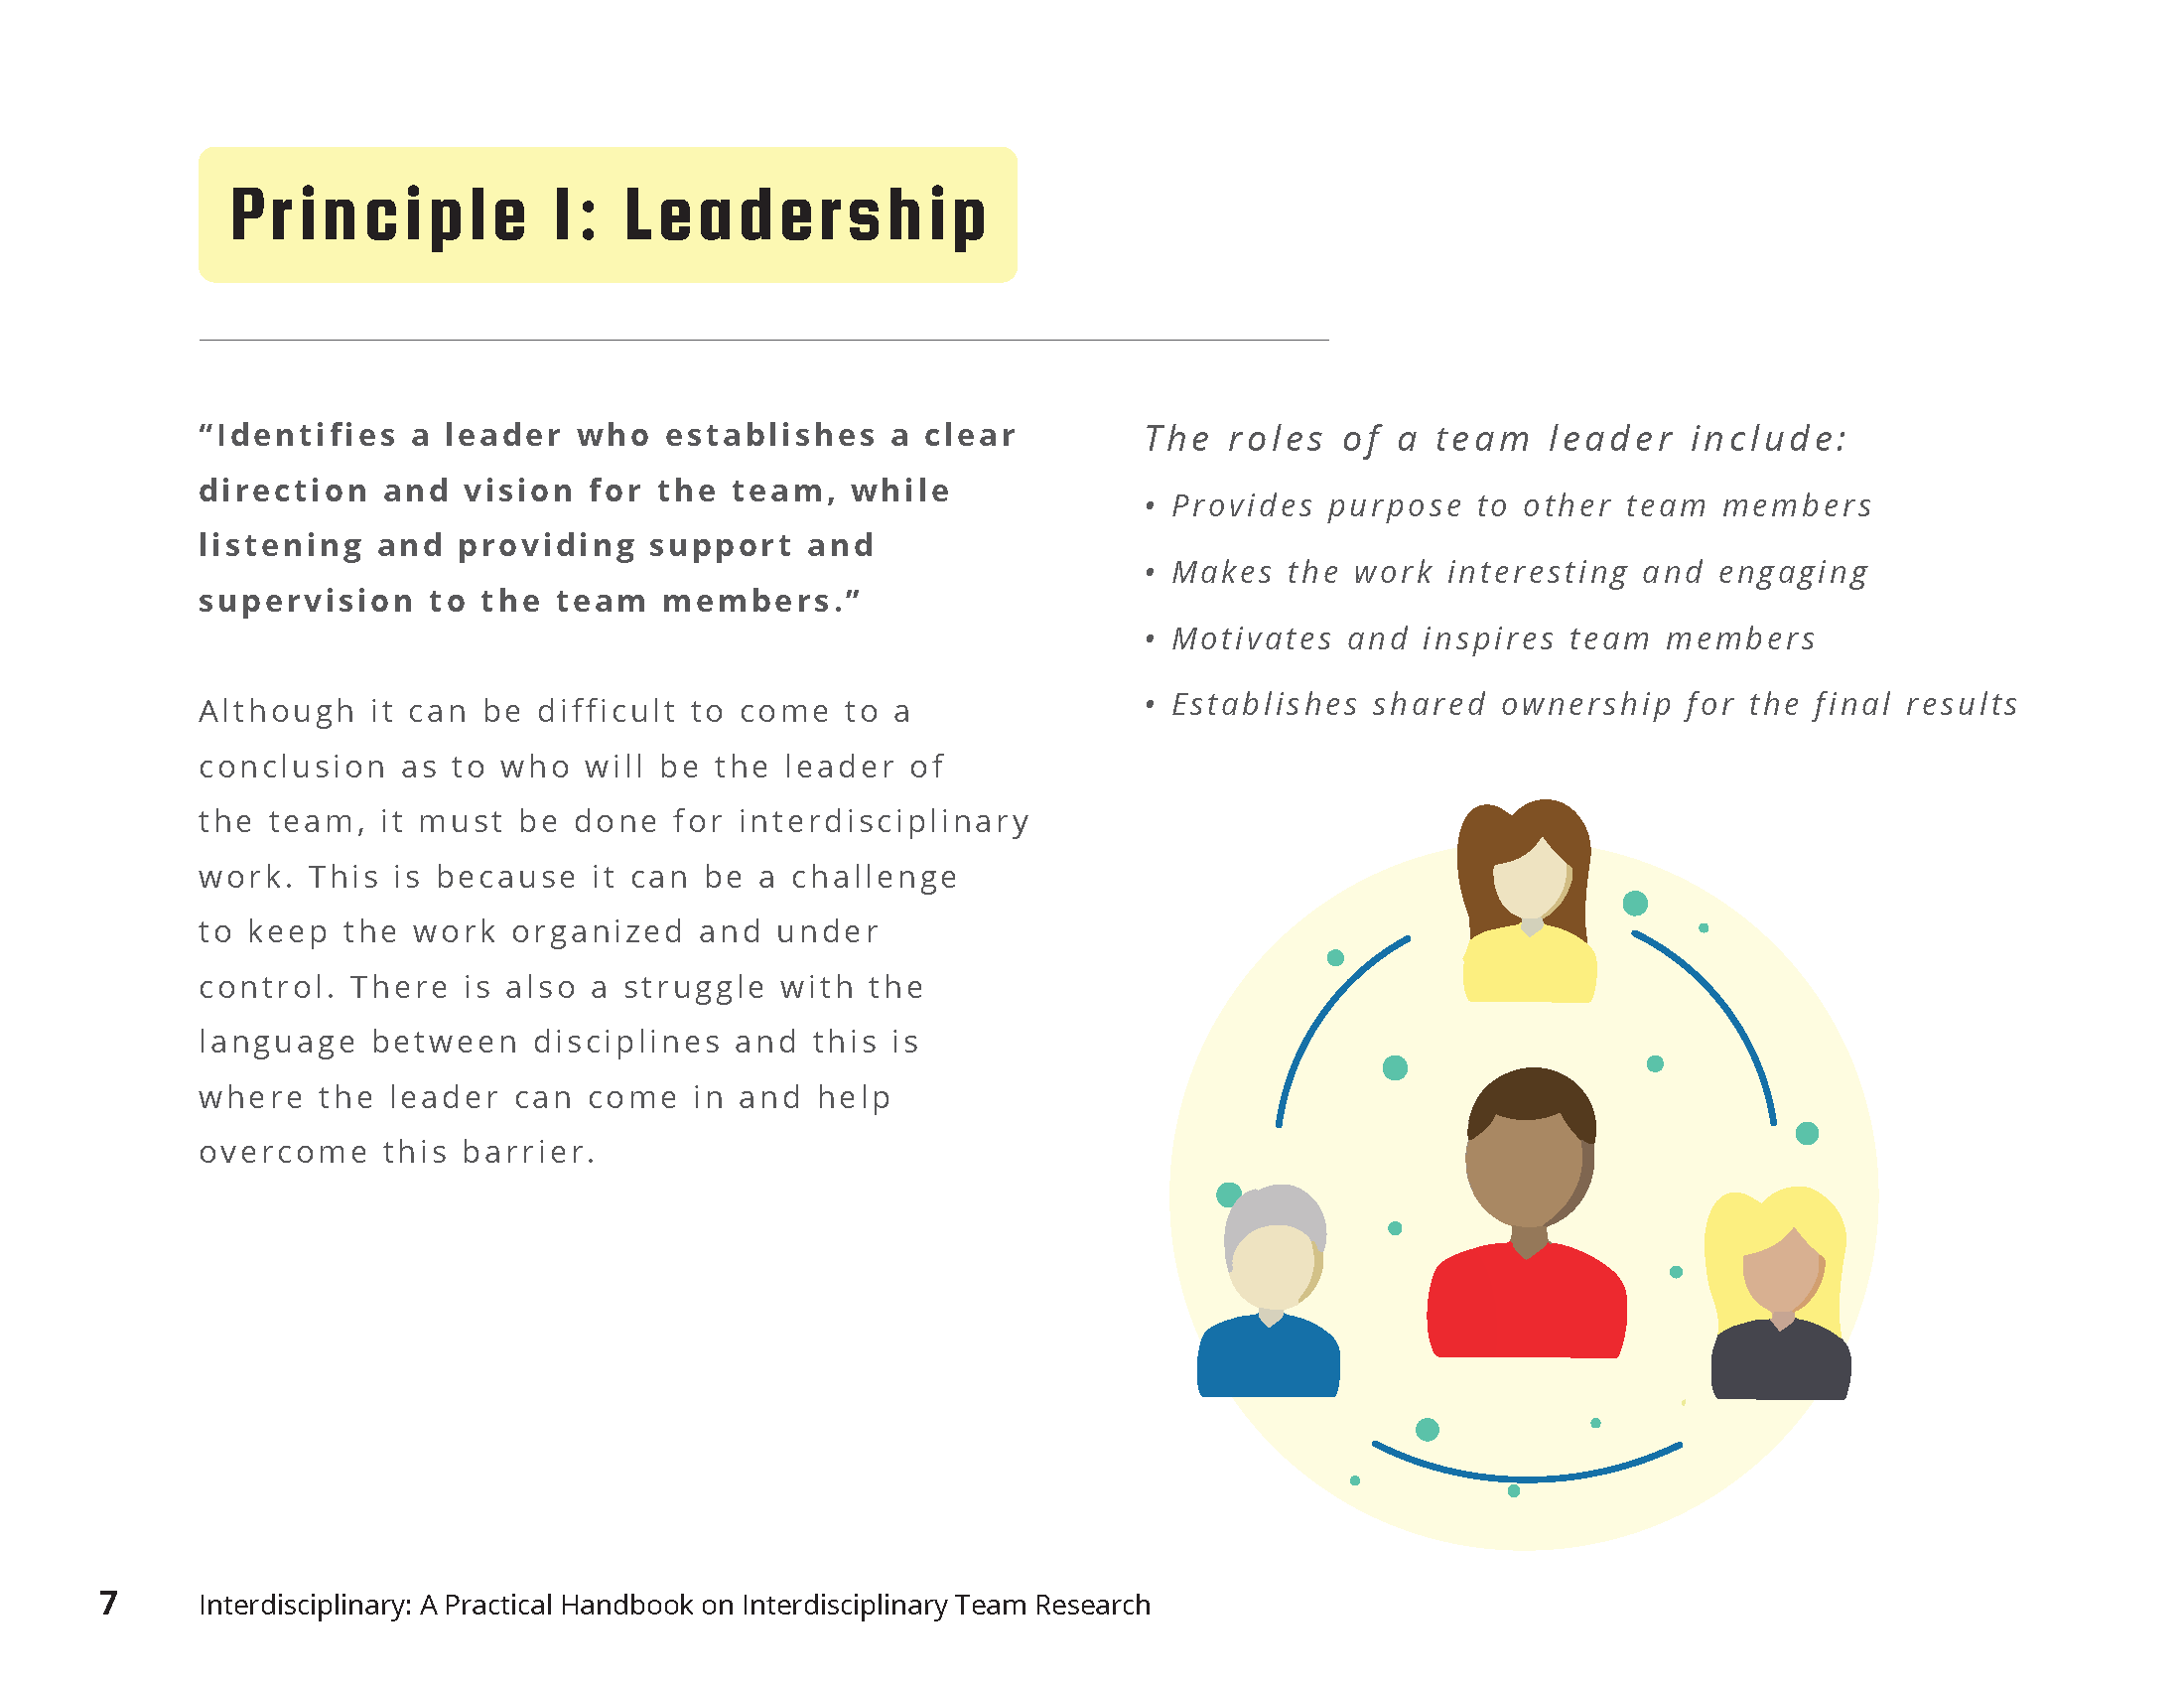 Interdisciplinary Handbook6_Page_08.png